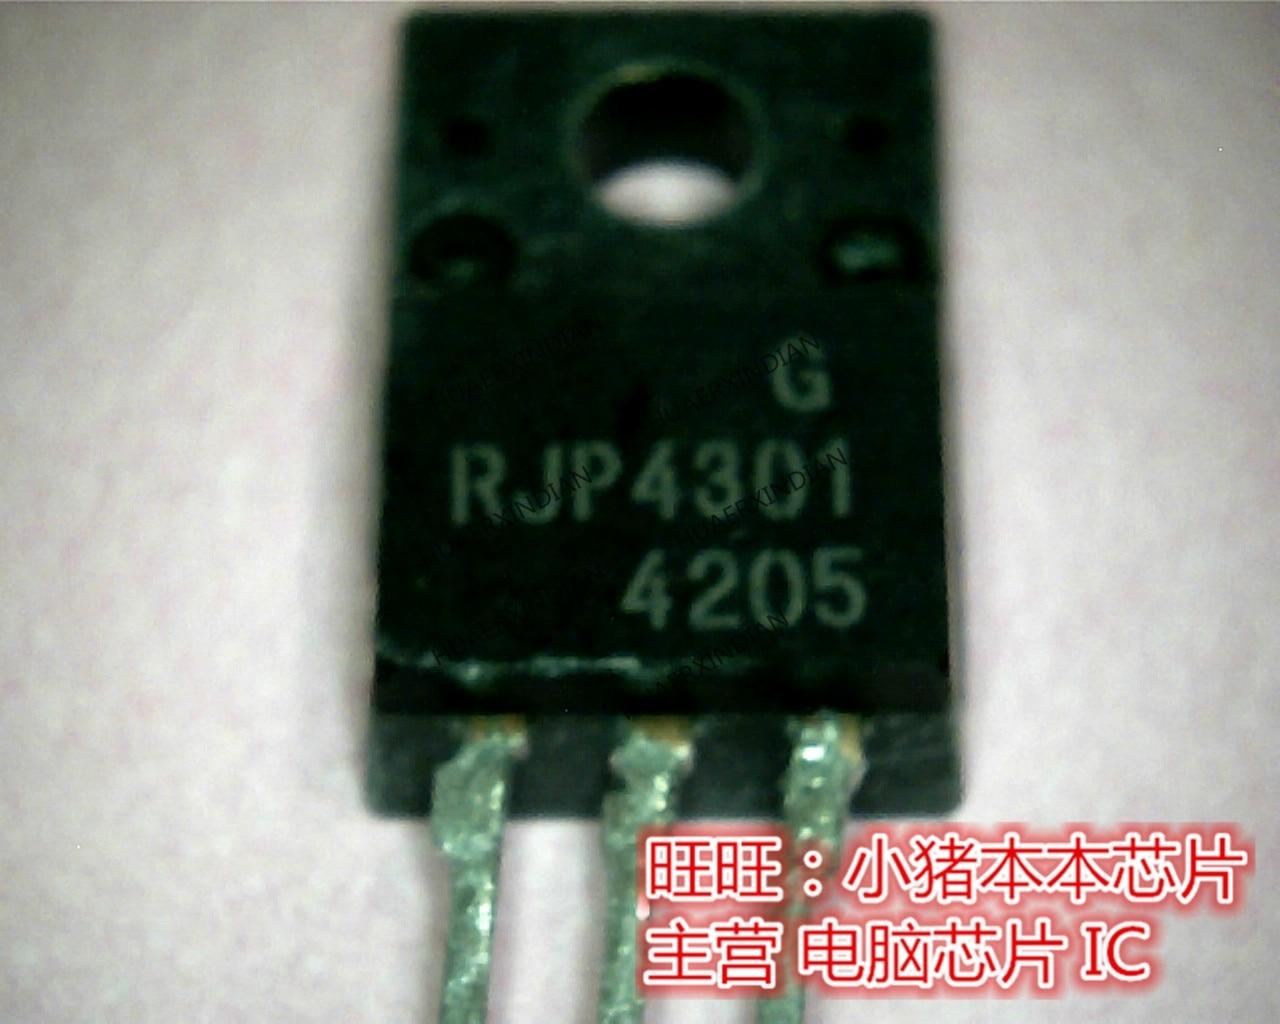 Nuevo original RJP4301 TO220F de alta calidad